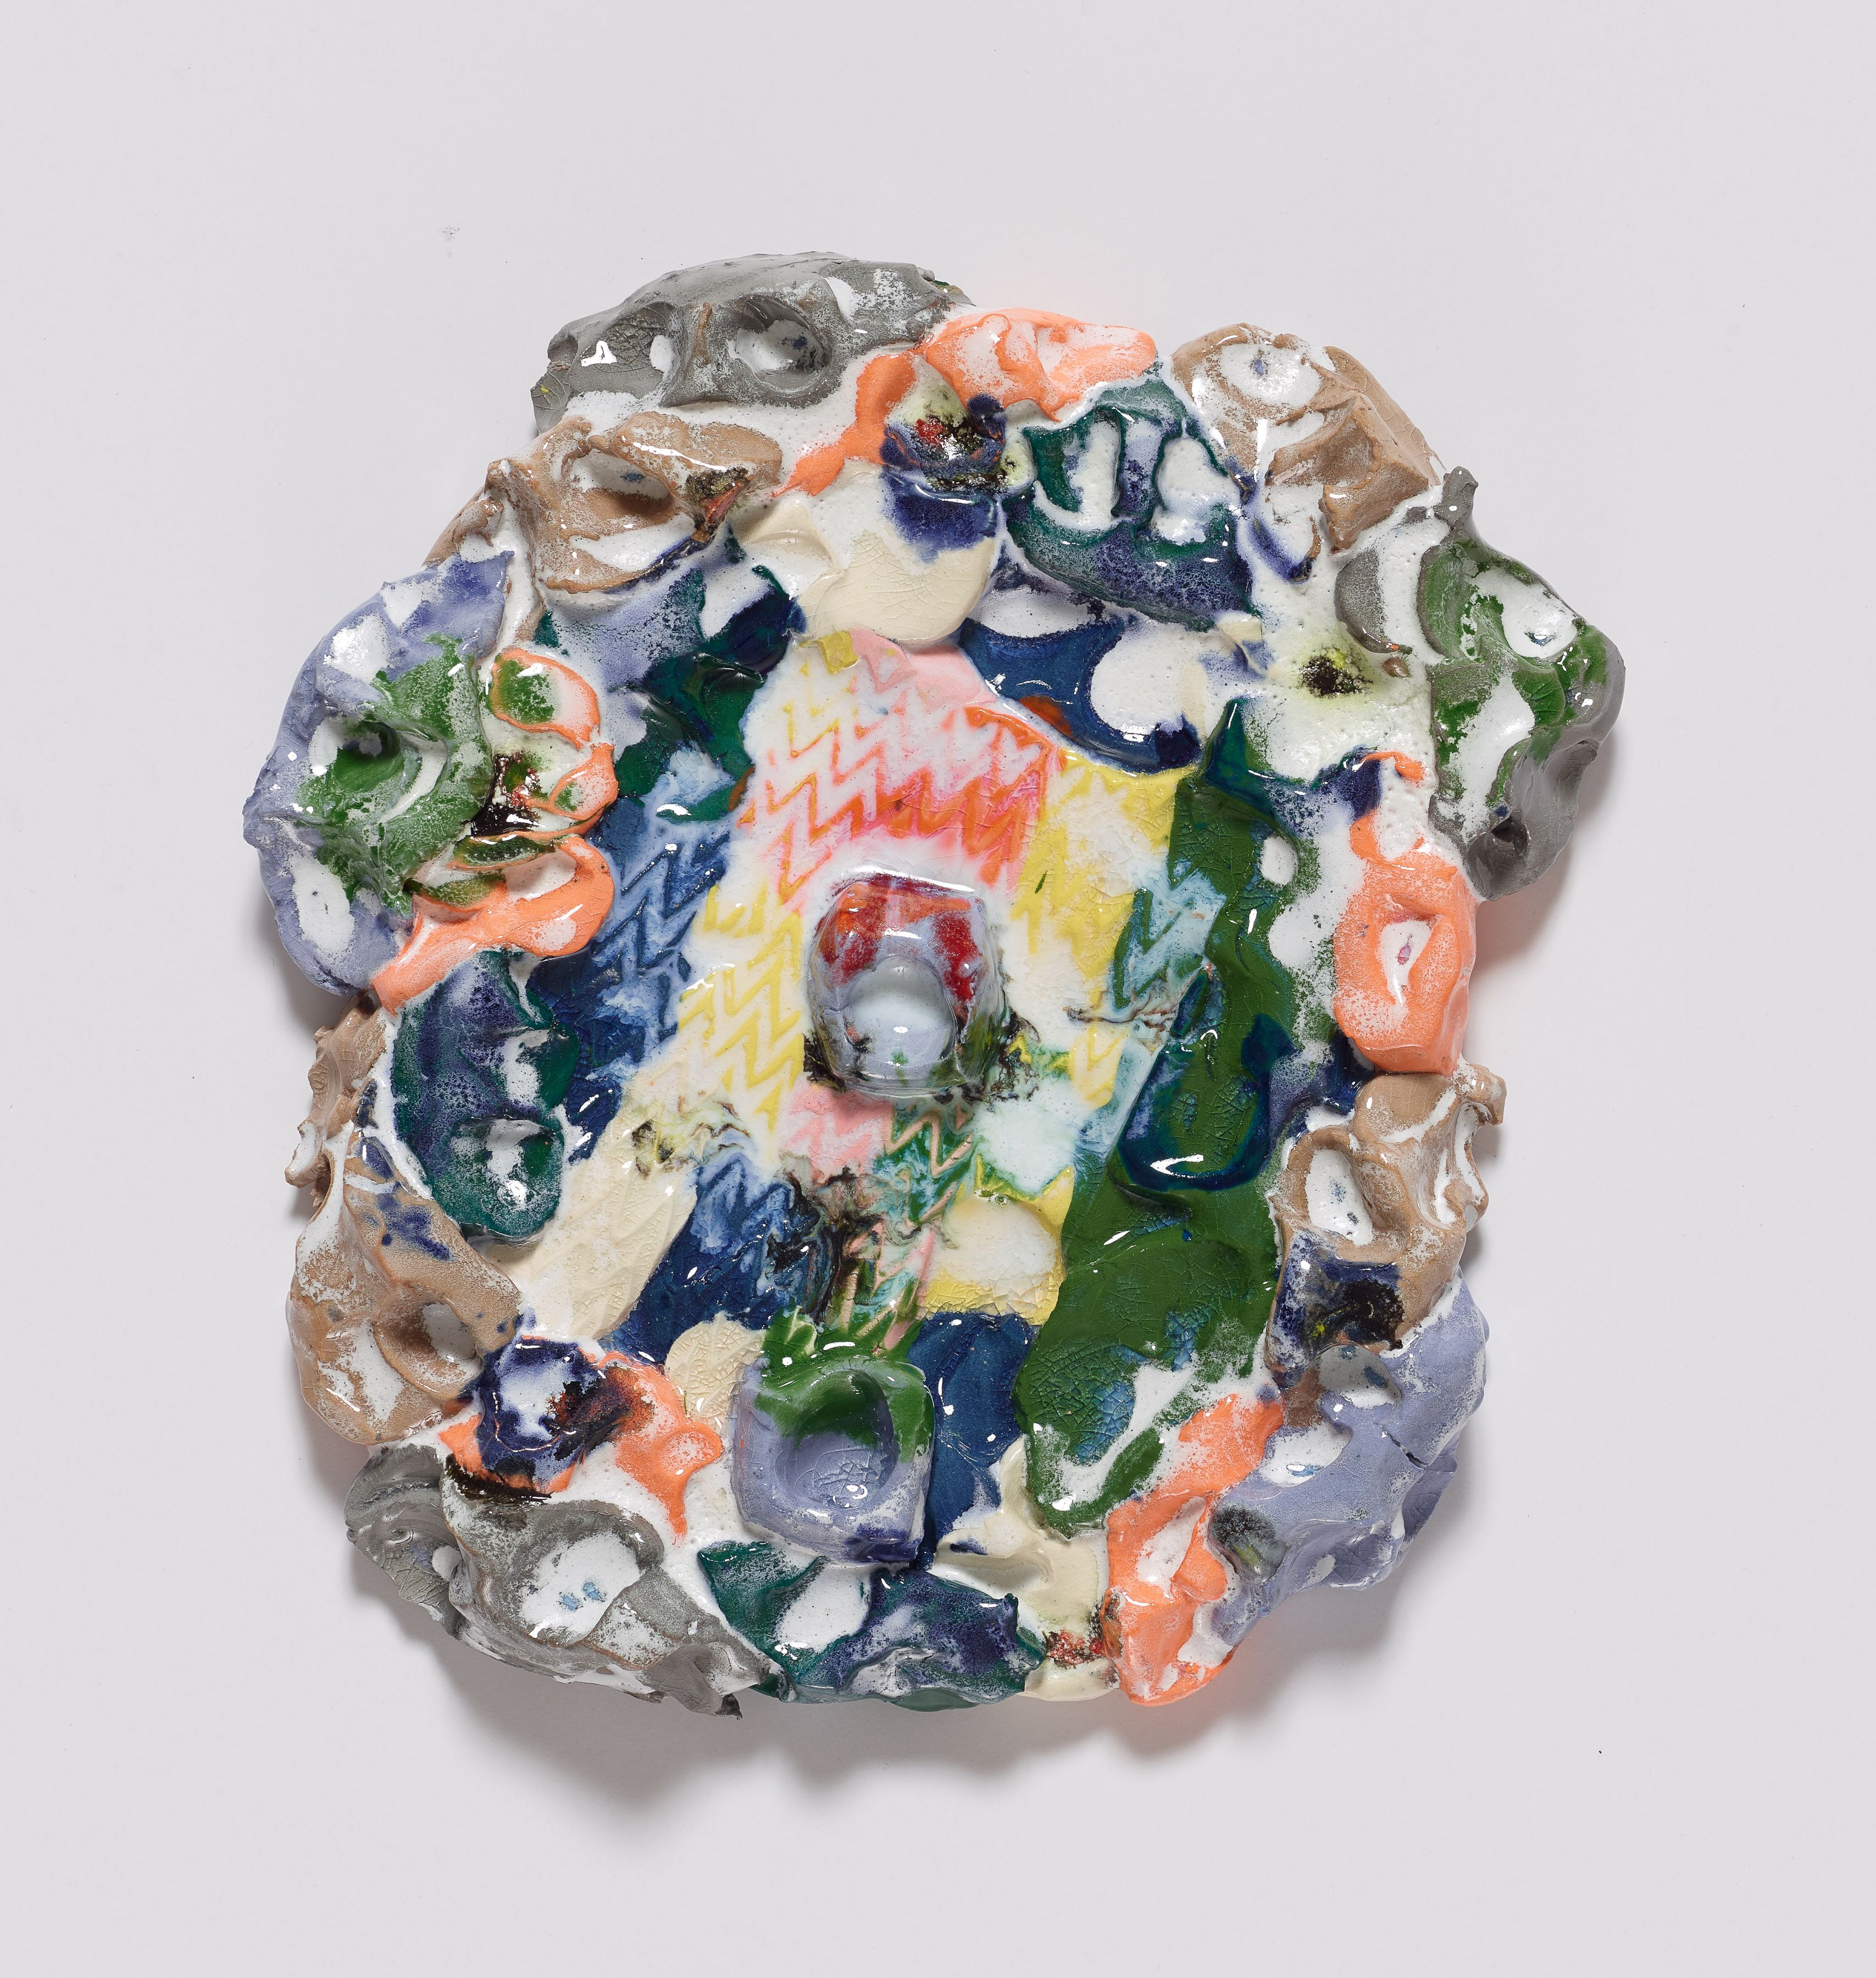 Tina, 2014, Colored porcelain and glaze